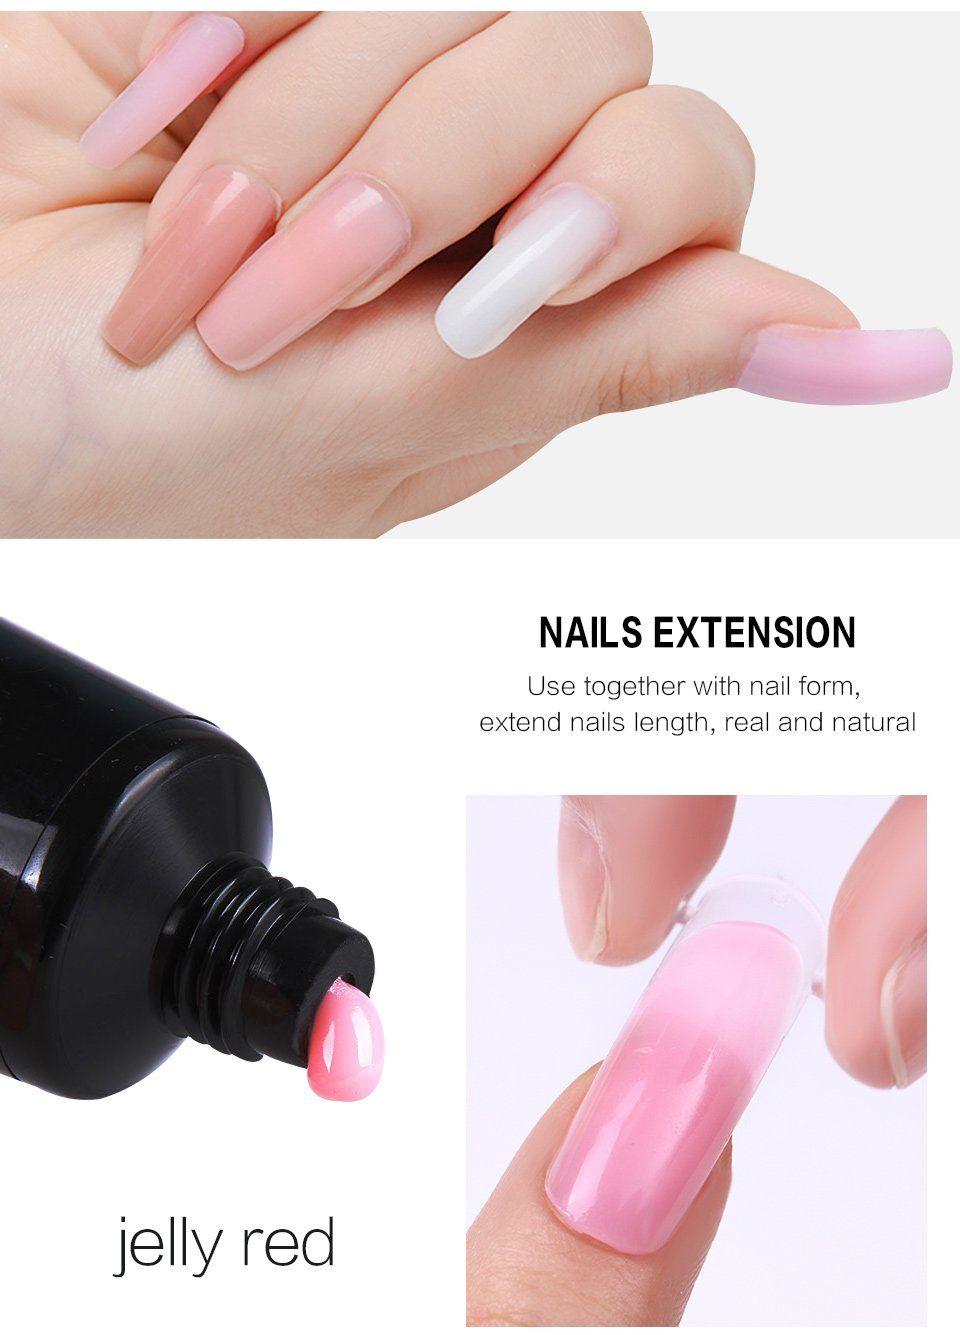 Polygel Nail Builder Nail Trends Nail Design Nail Ideas Pretty Nail Different Nail Nail Inspiration Nail Stuff Mul Polygel Nails Gel Manicure Gel Art Designs